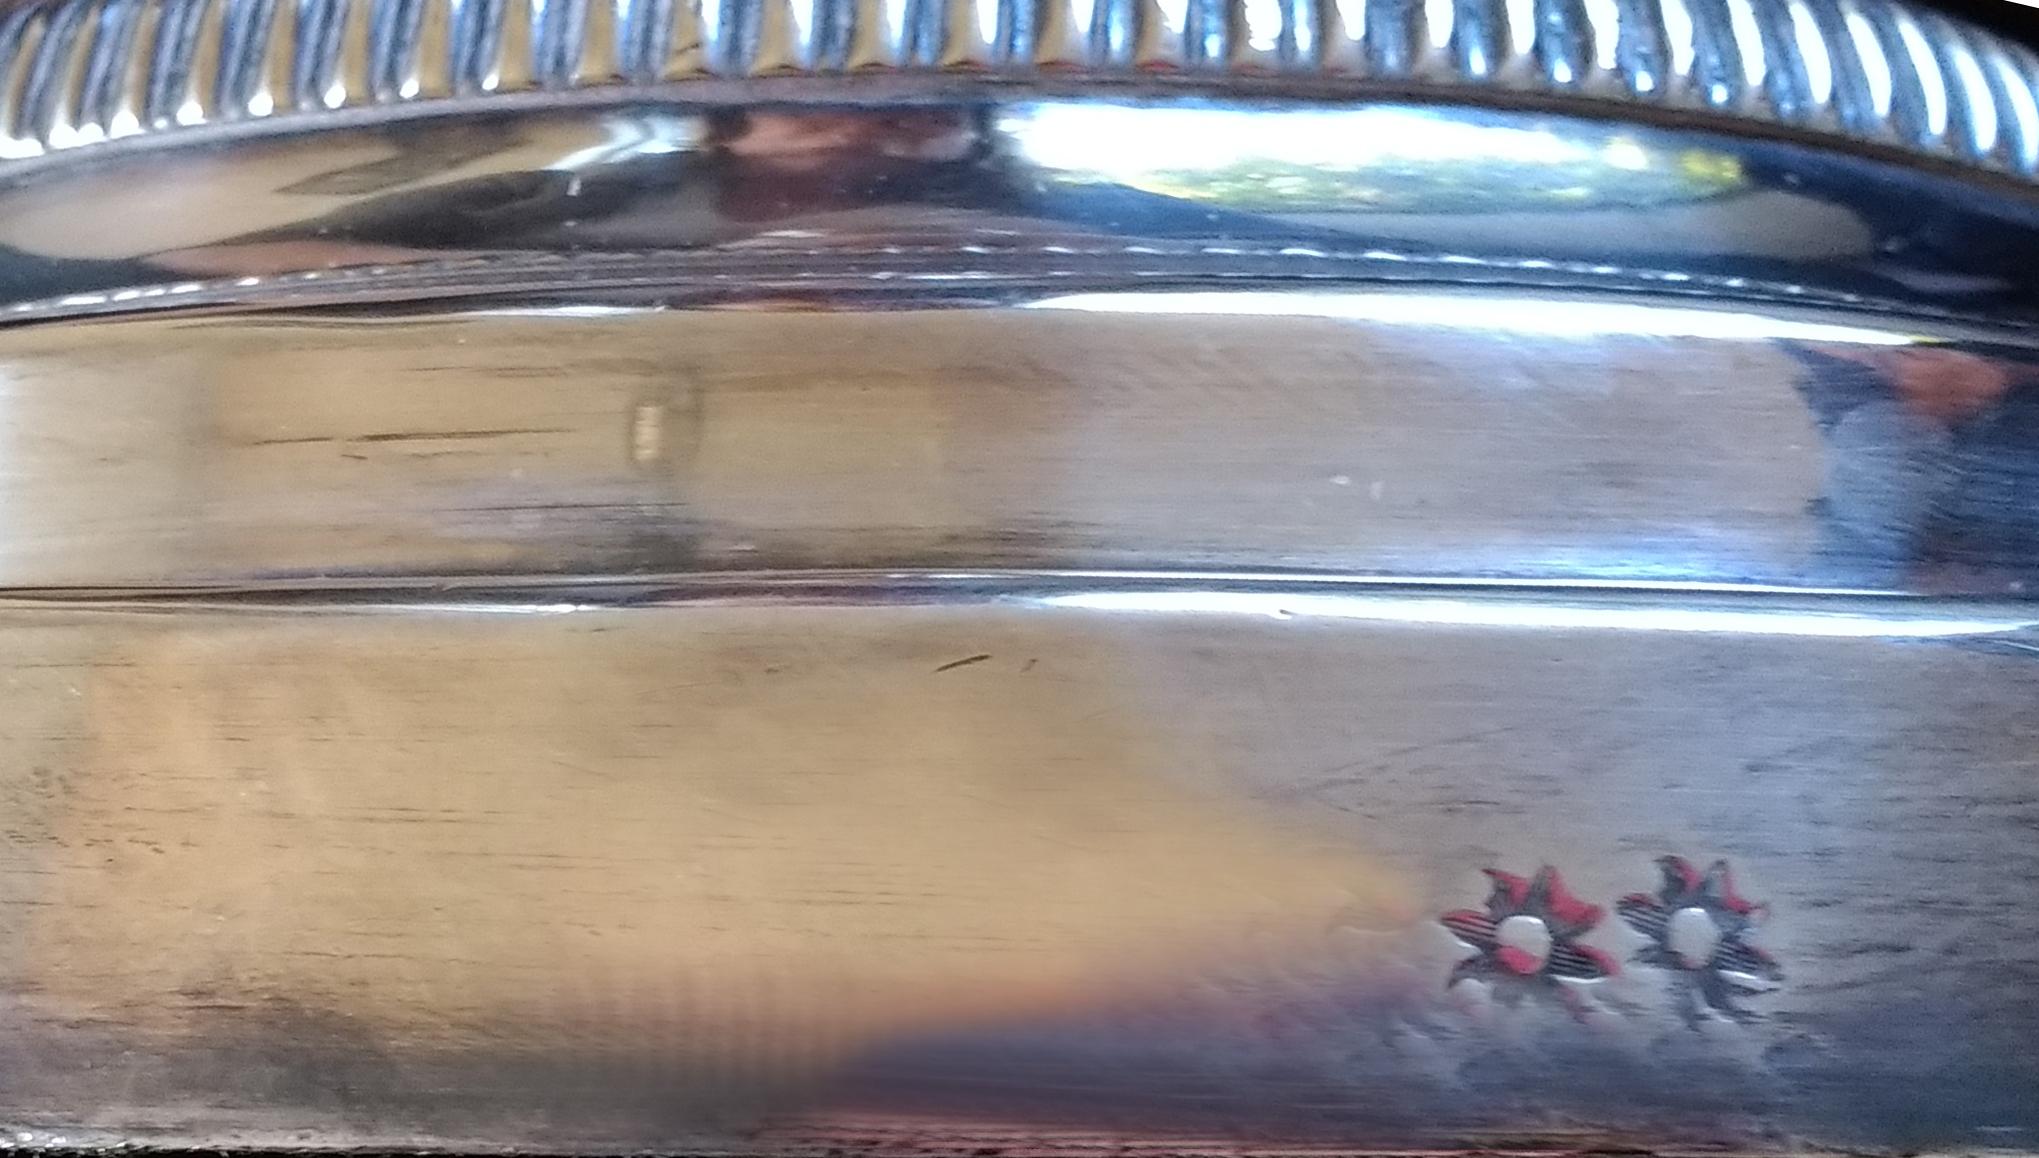 Matthew Boulton maker's mark on a candelabra base.